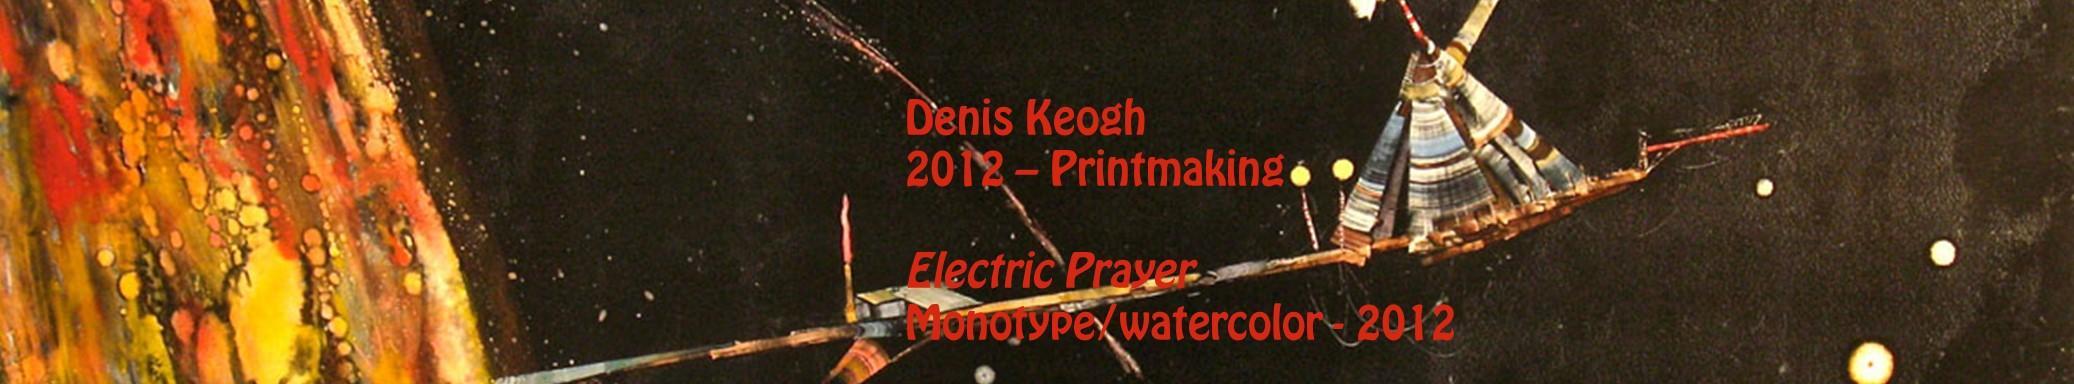 Denis Keogh - Printmaking - Electric Prayer - Monotype, watercolor - 2012